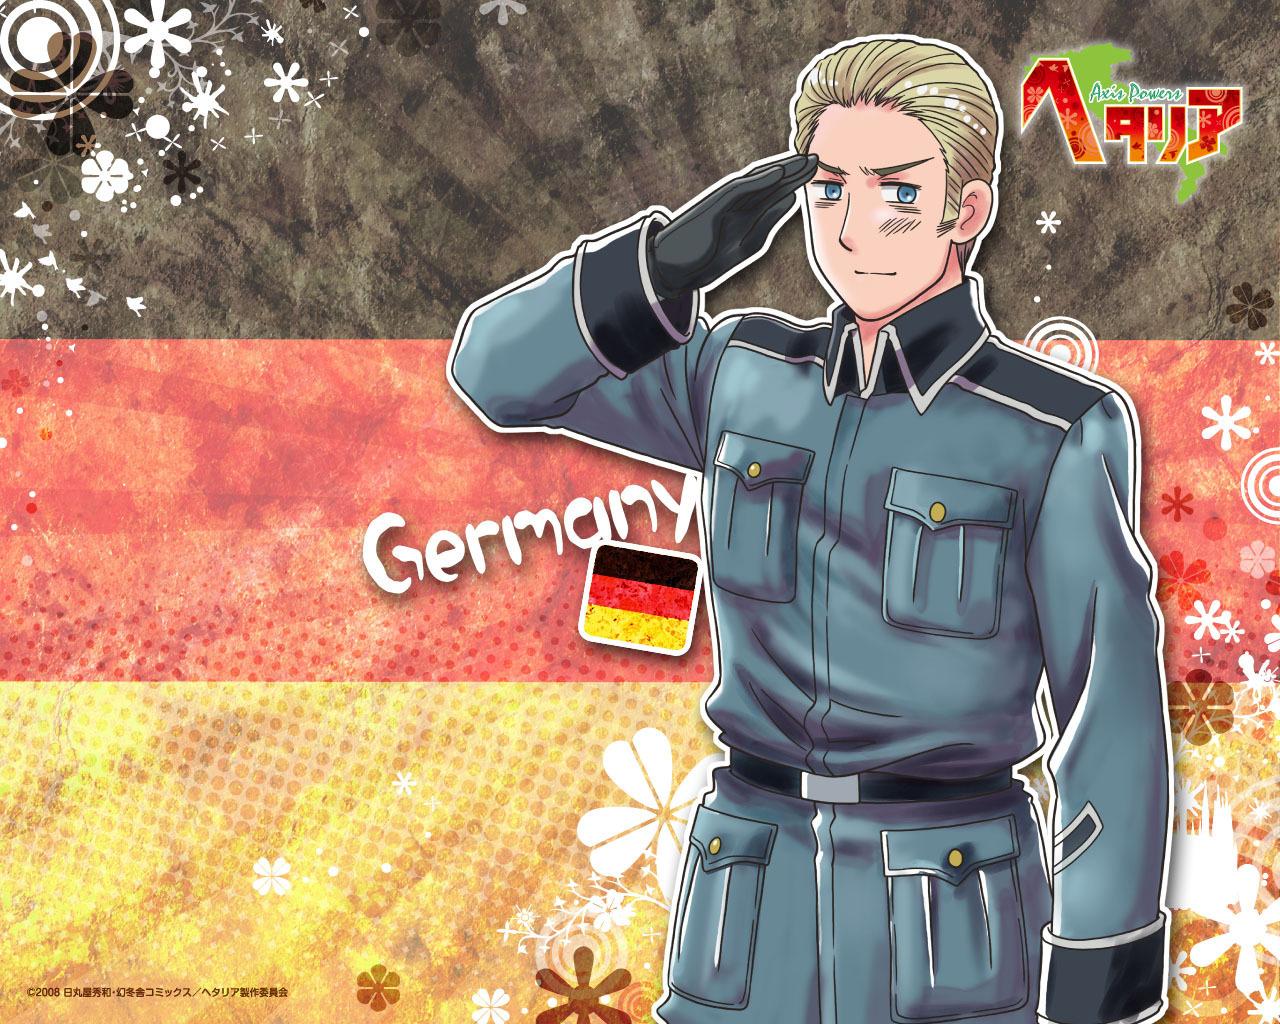 http://4.bp.blogspot.com/_2n9G8hS3AbI/TU4OZmh2_uI/AAAAAAAACWU/txfdBhu-wb8/s1600/Axis+Hetalia+Power+Germany+Wallpaper.jpg